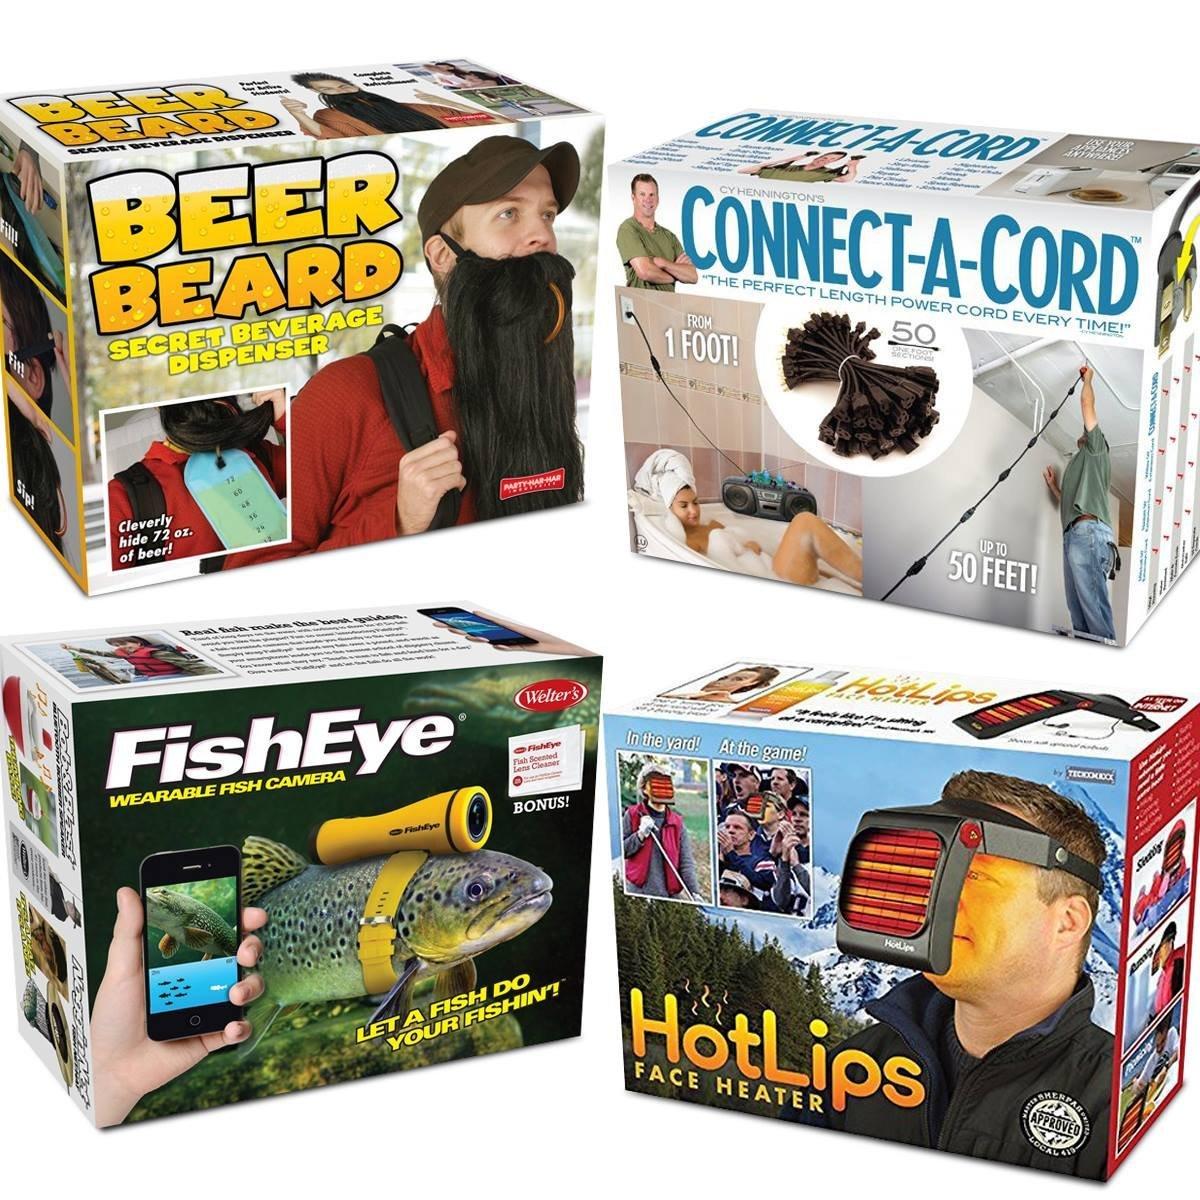 Prank Pack Men u2013 4 Funny Gag Gift Boxes u2013 Beer Beard - Fish Eye -  sc 1 st  Alibaba & Buy Prank Pack Men u2013 4 Funny Gag Gift Boxes u2013 Beer Beard - Fish Eye ...